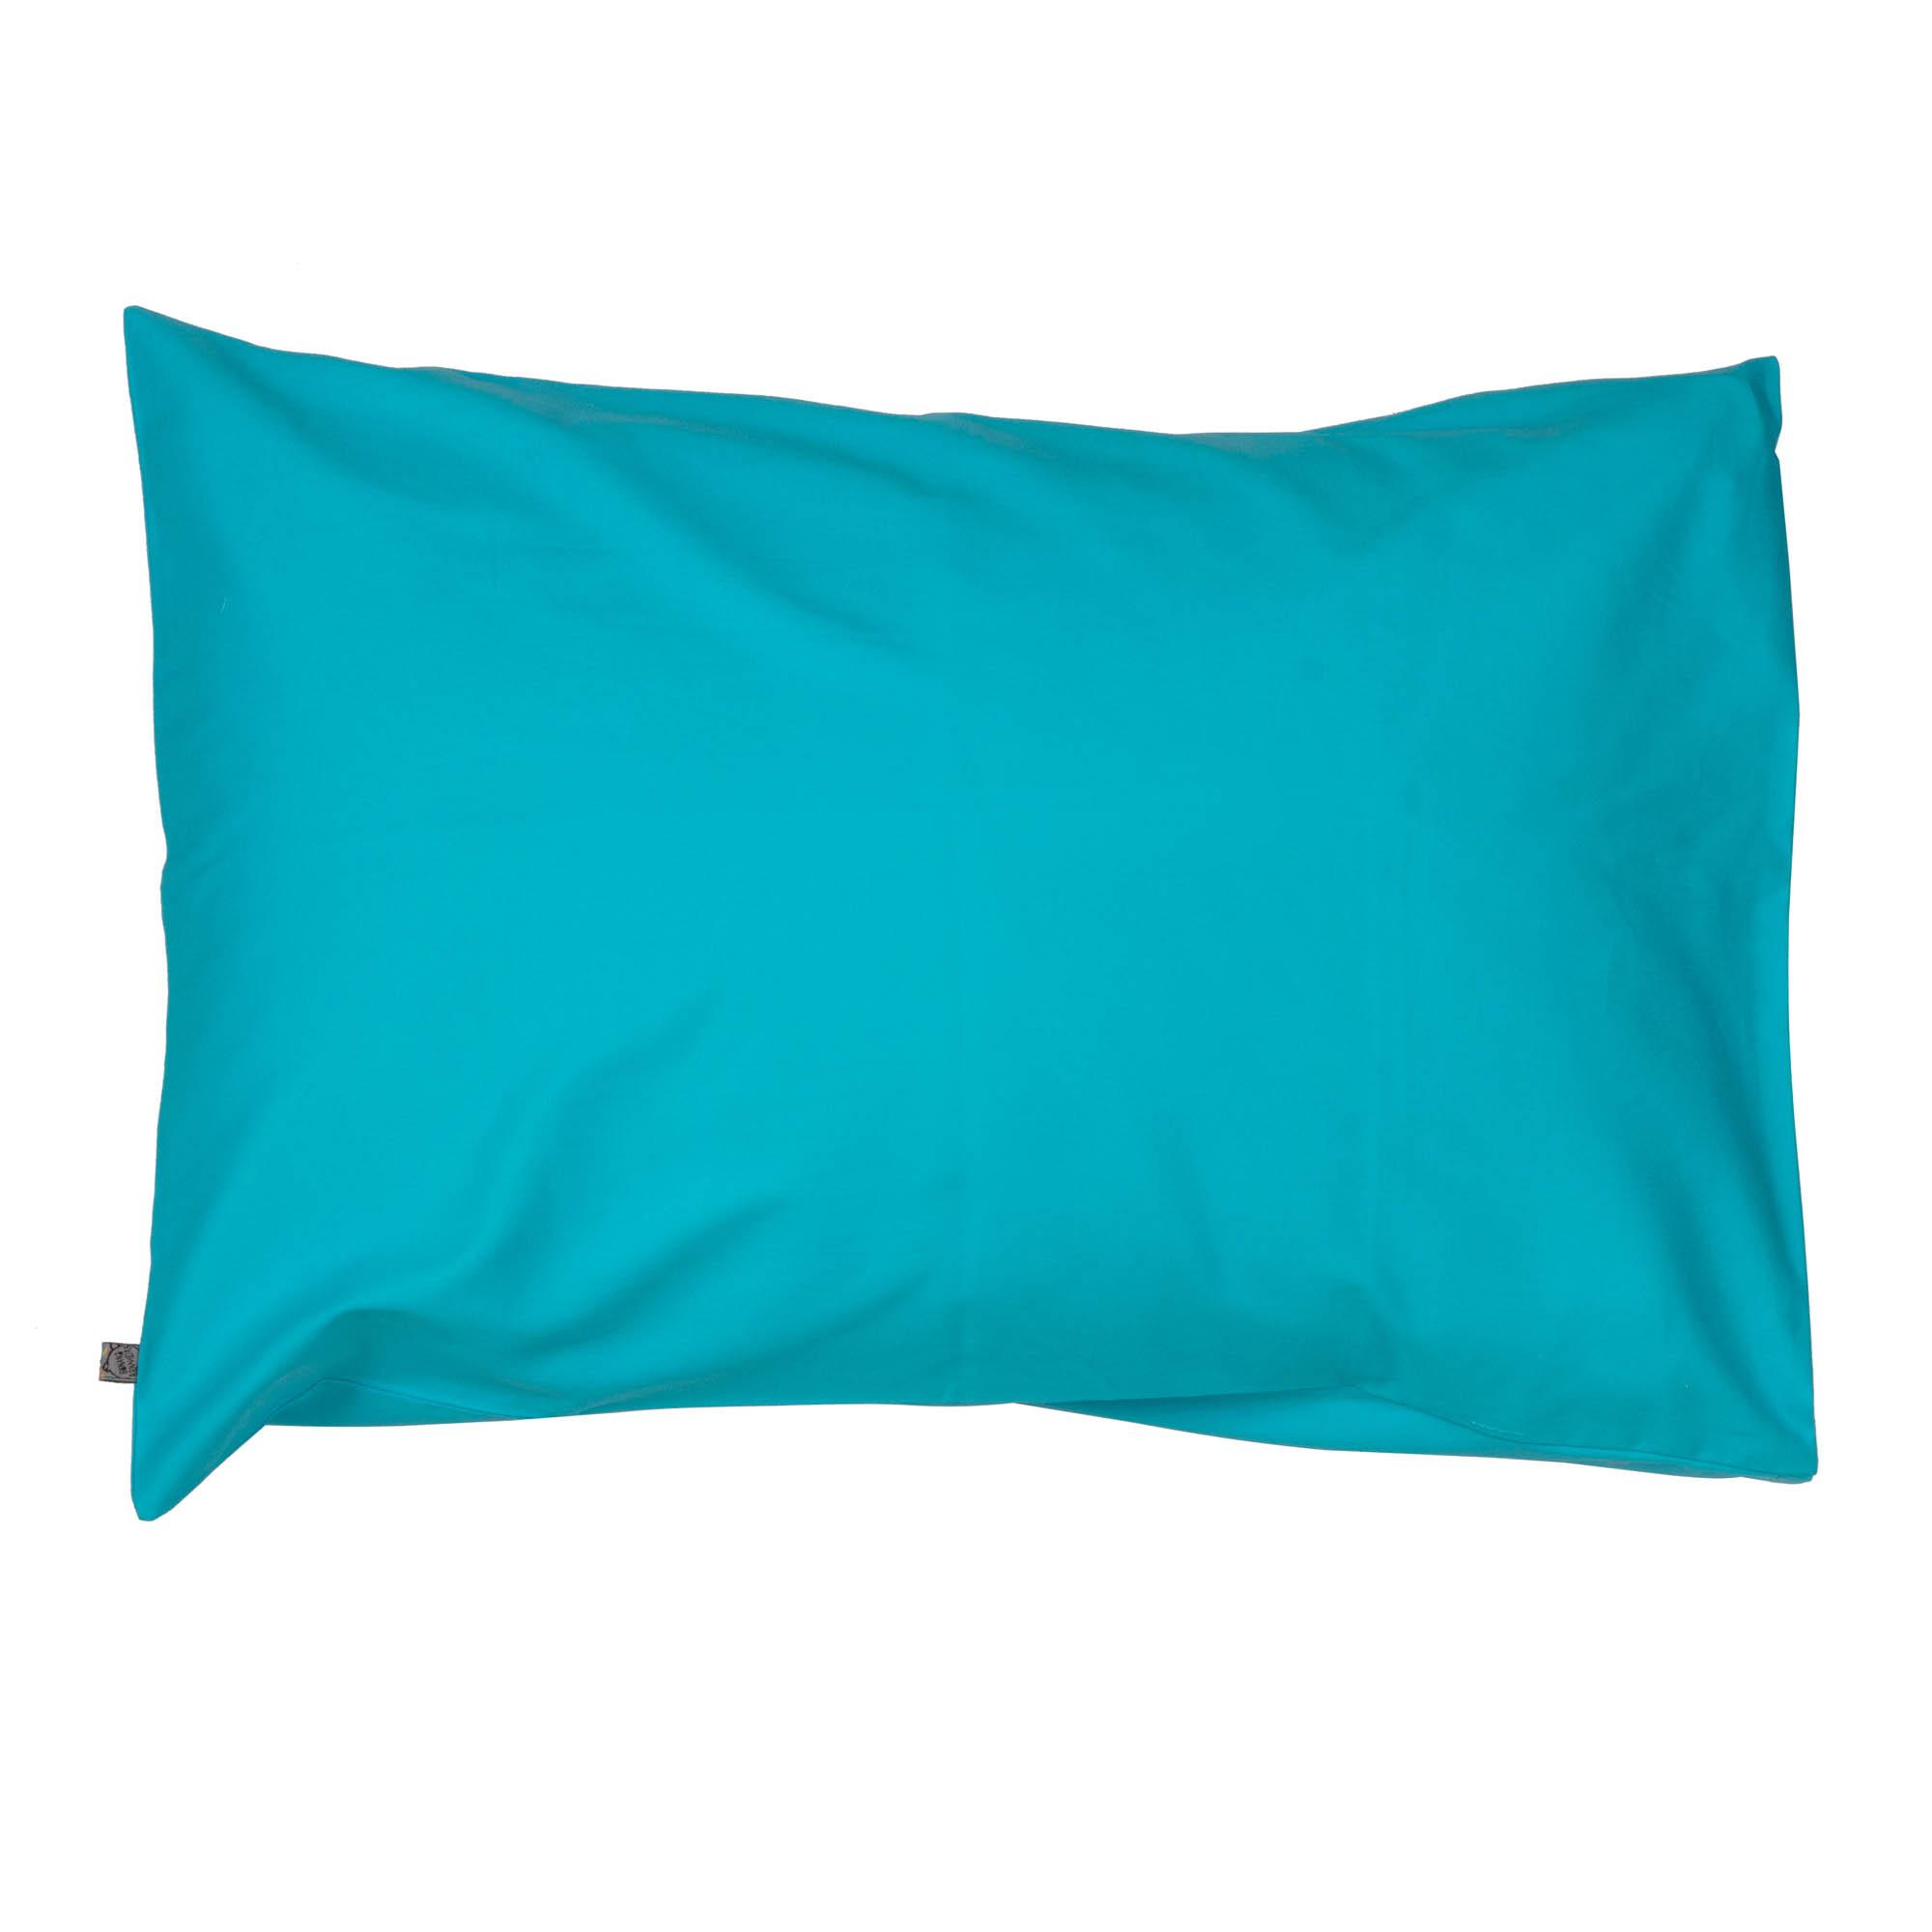 Porta travesseiro liso azul turquesa